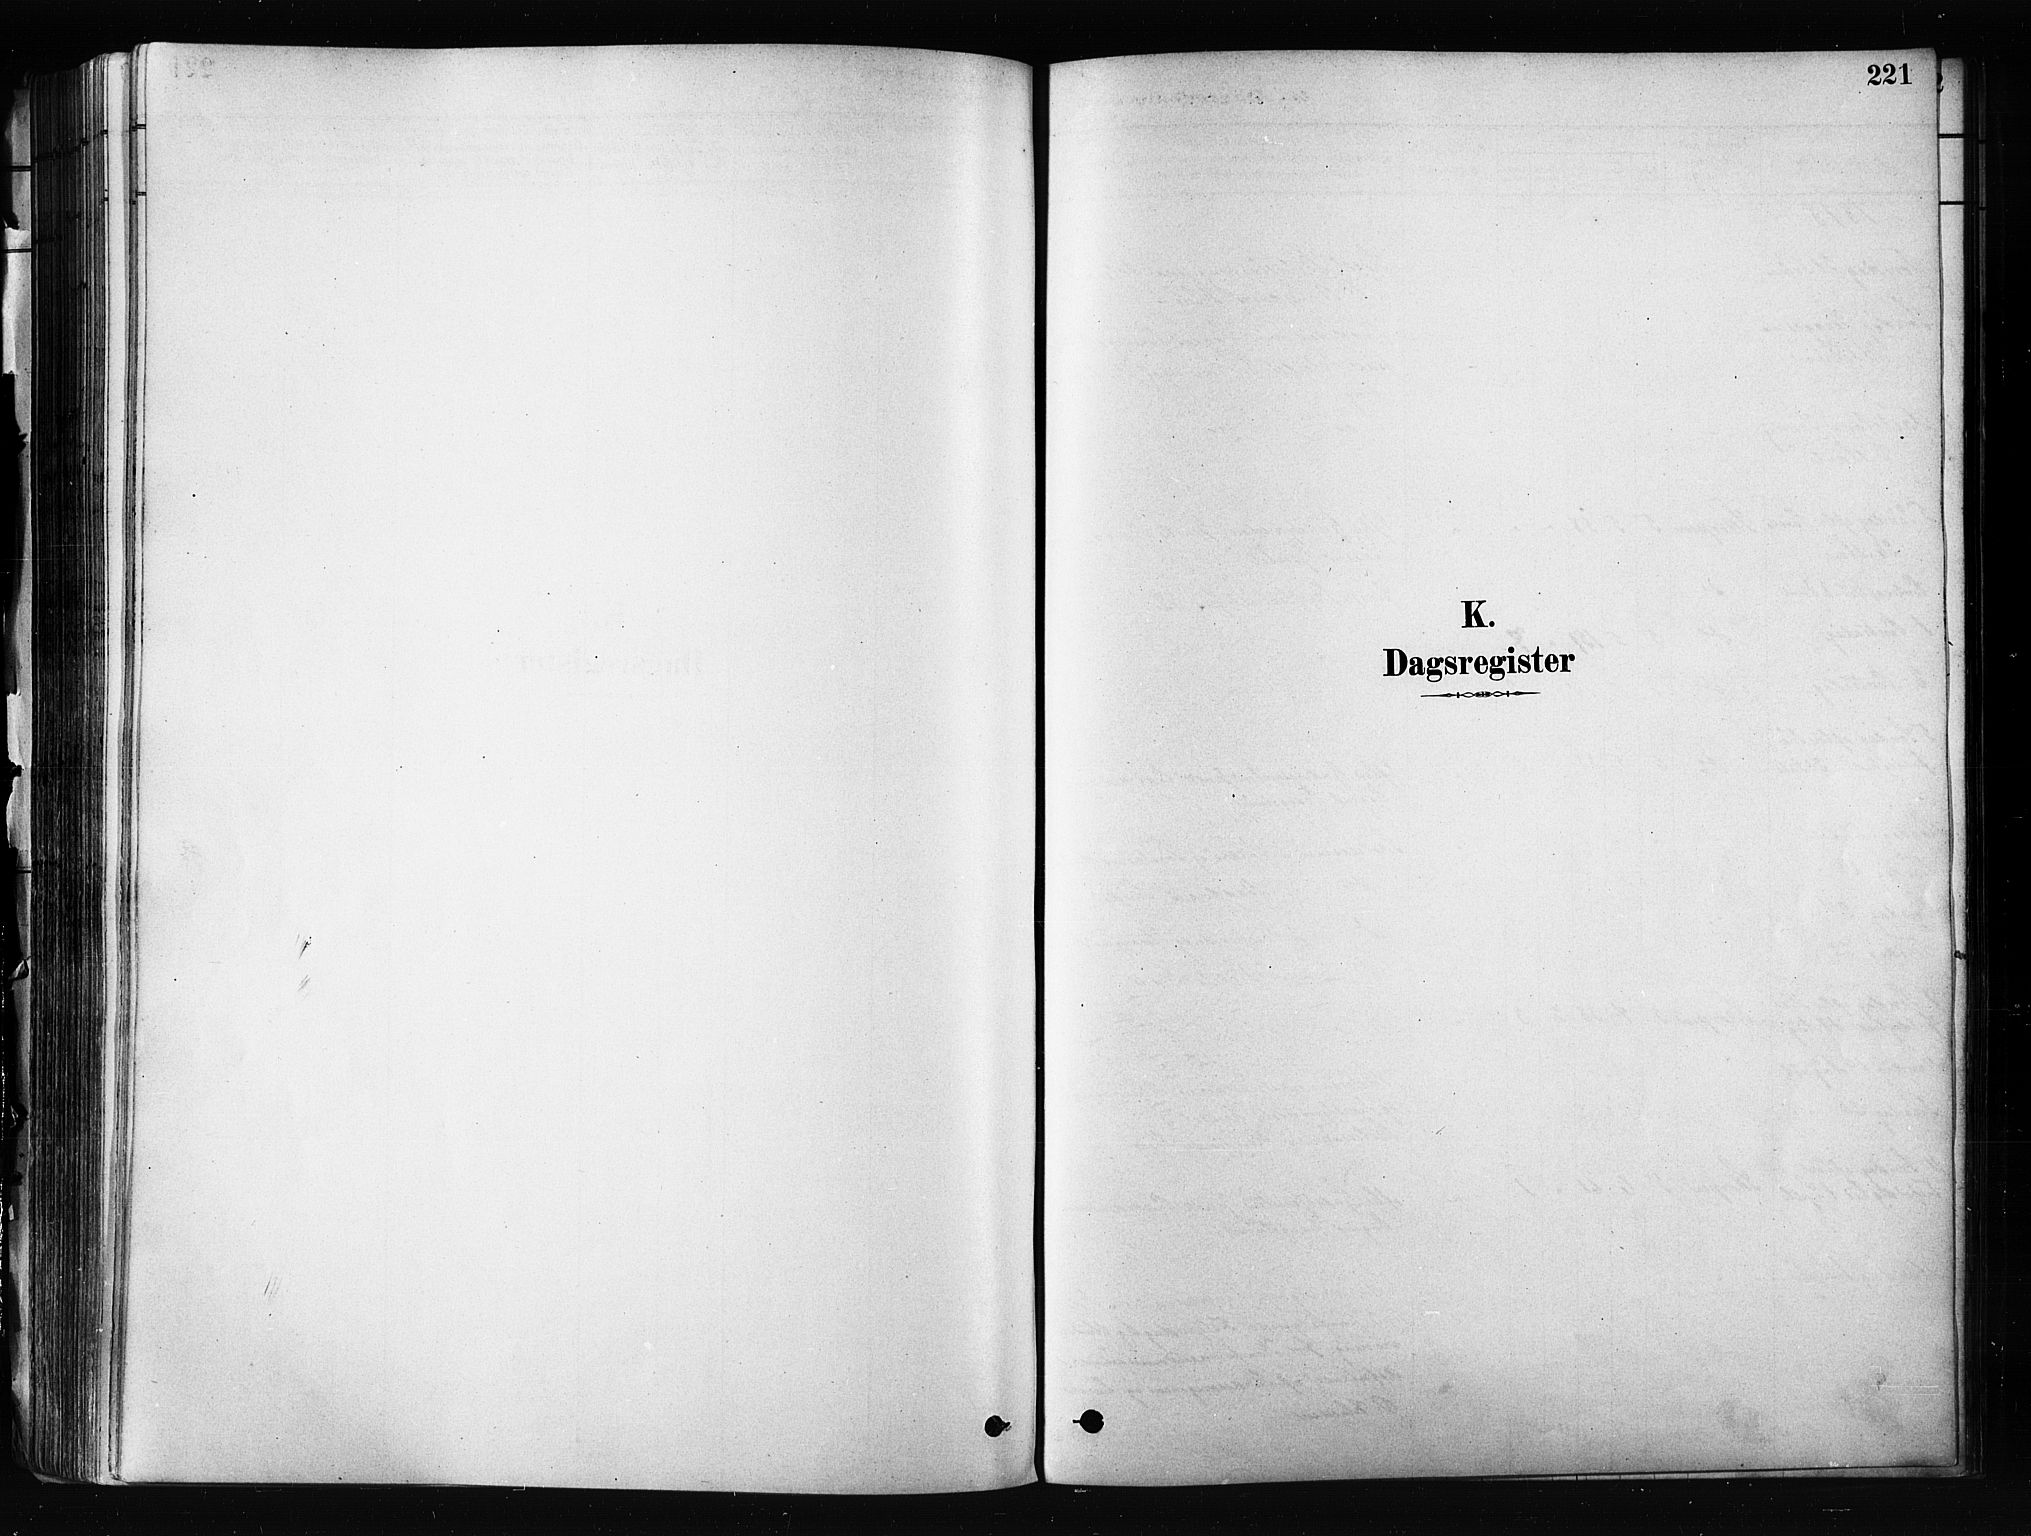 SATØ, Skjervøy sokneprestkontor, H/Ha/Haa/L0012kirke: Ministerialbok nr. 12, 1878-1891, s. 221